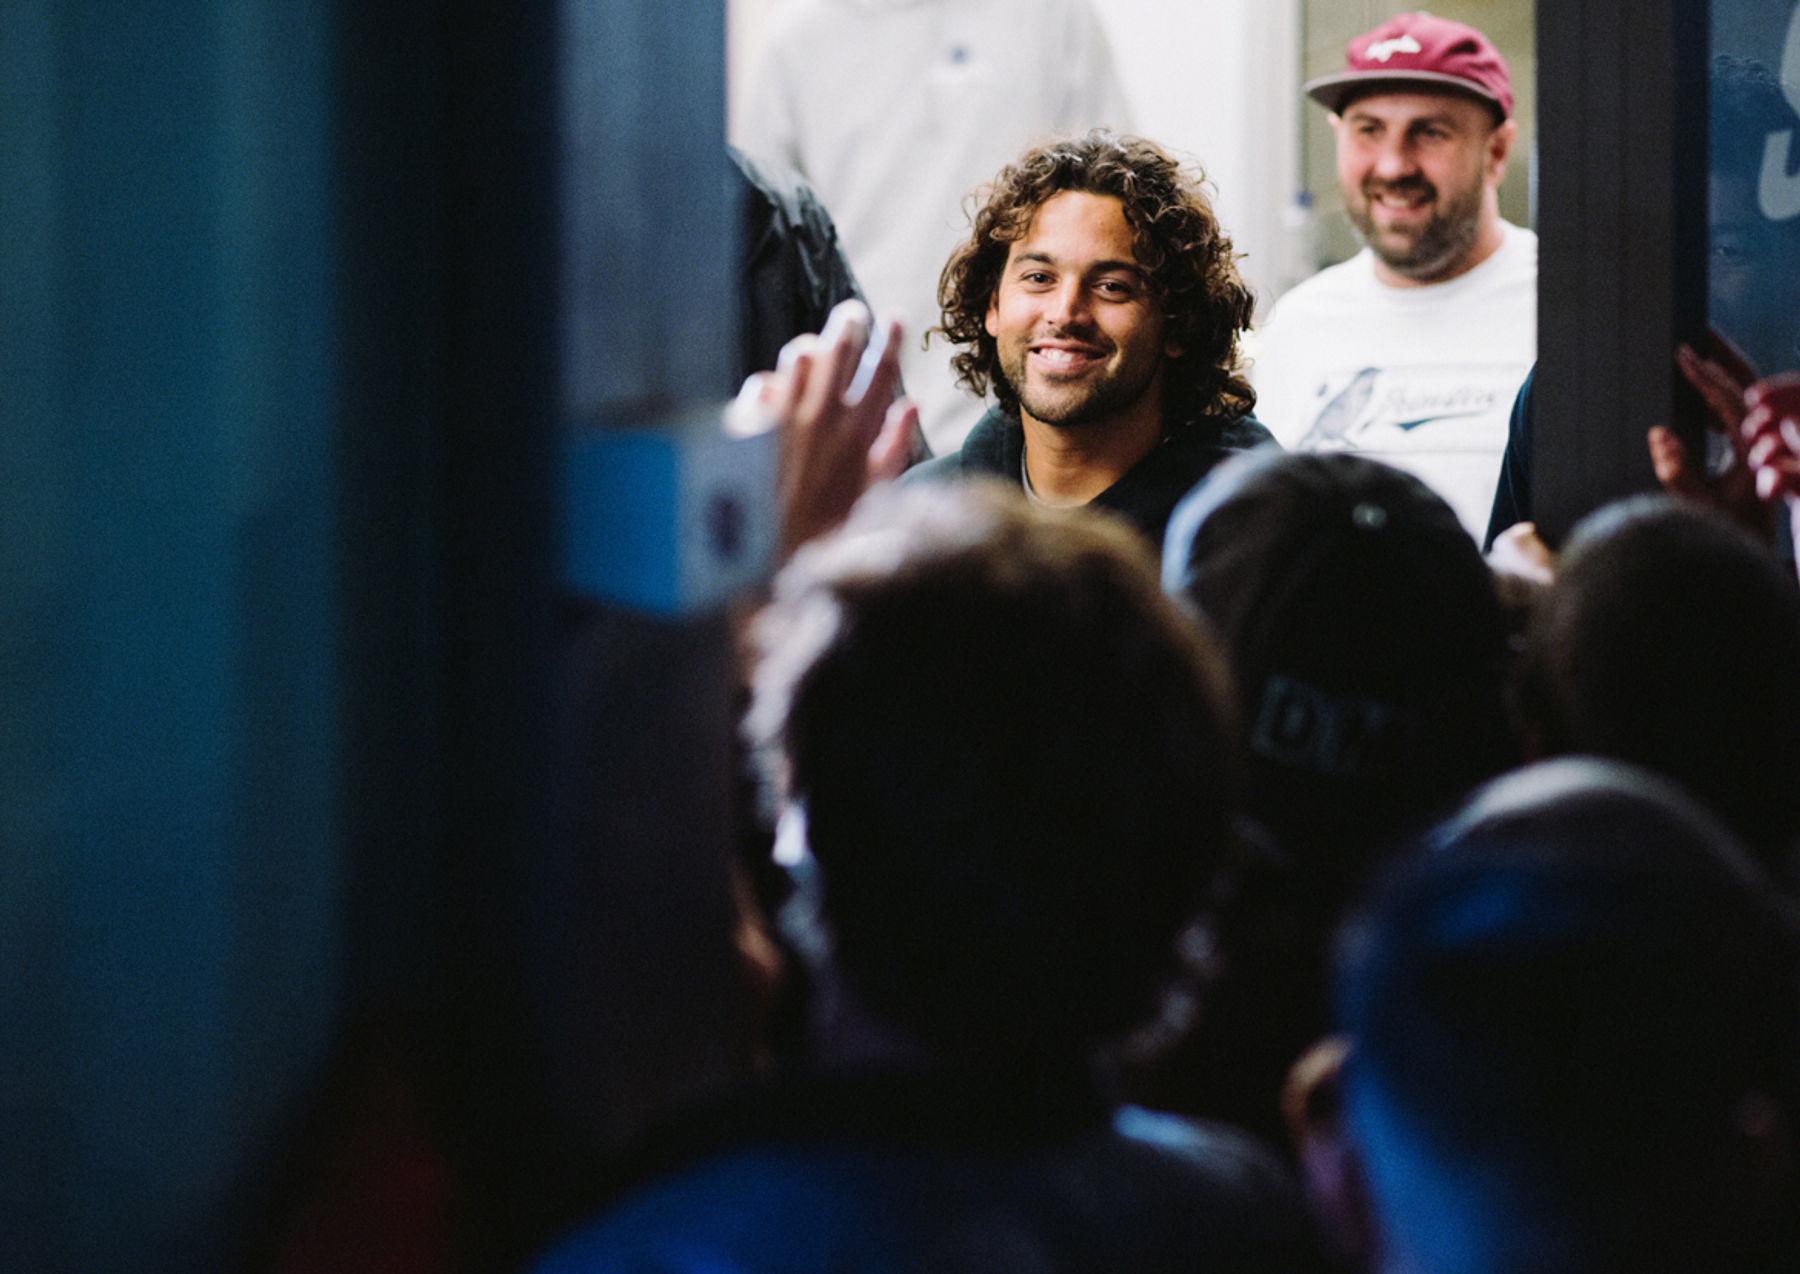 _IHC2828e-Paul-Rodriguez-Primitive-Skateboards-Demo-BaySixty6-London-May-2015-Photographer-Maksim-Kalanep